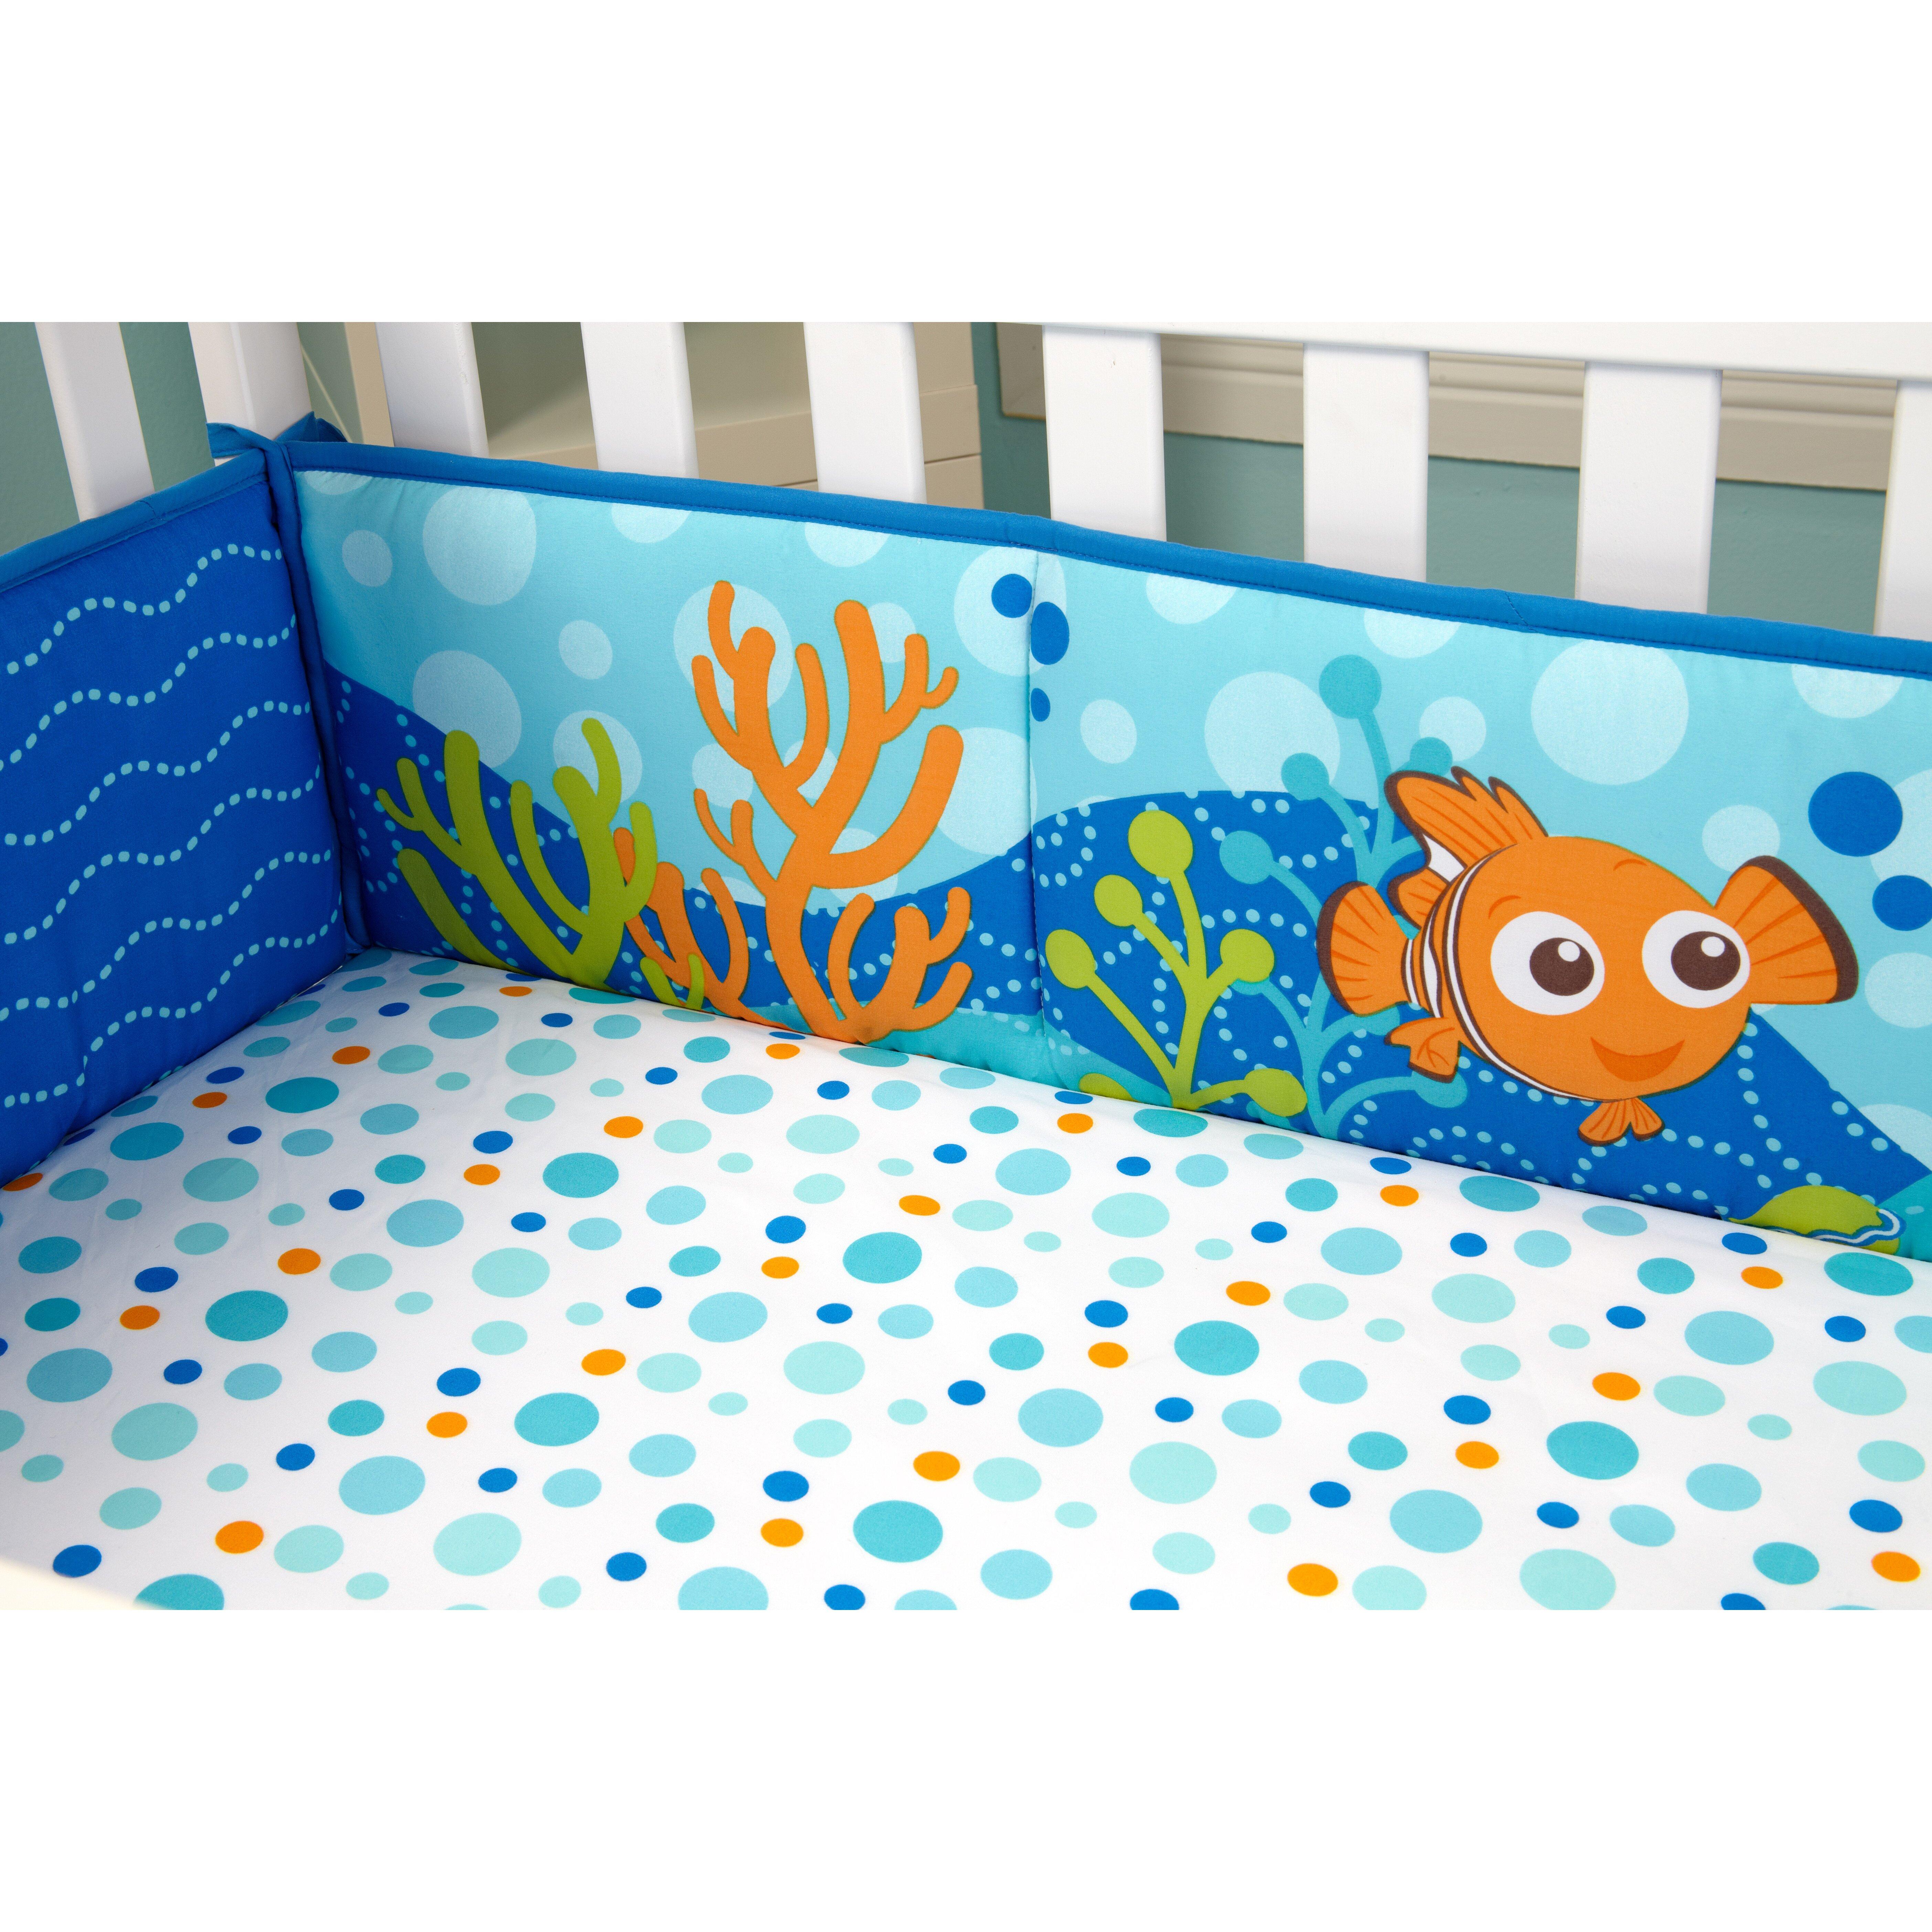 Bumper for crib for sale - Disney Finding Nemo Traditional Padded Crib Bumper